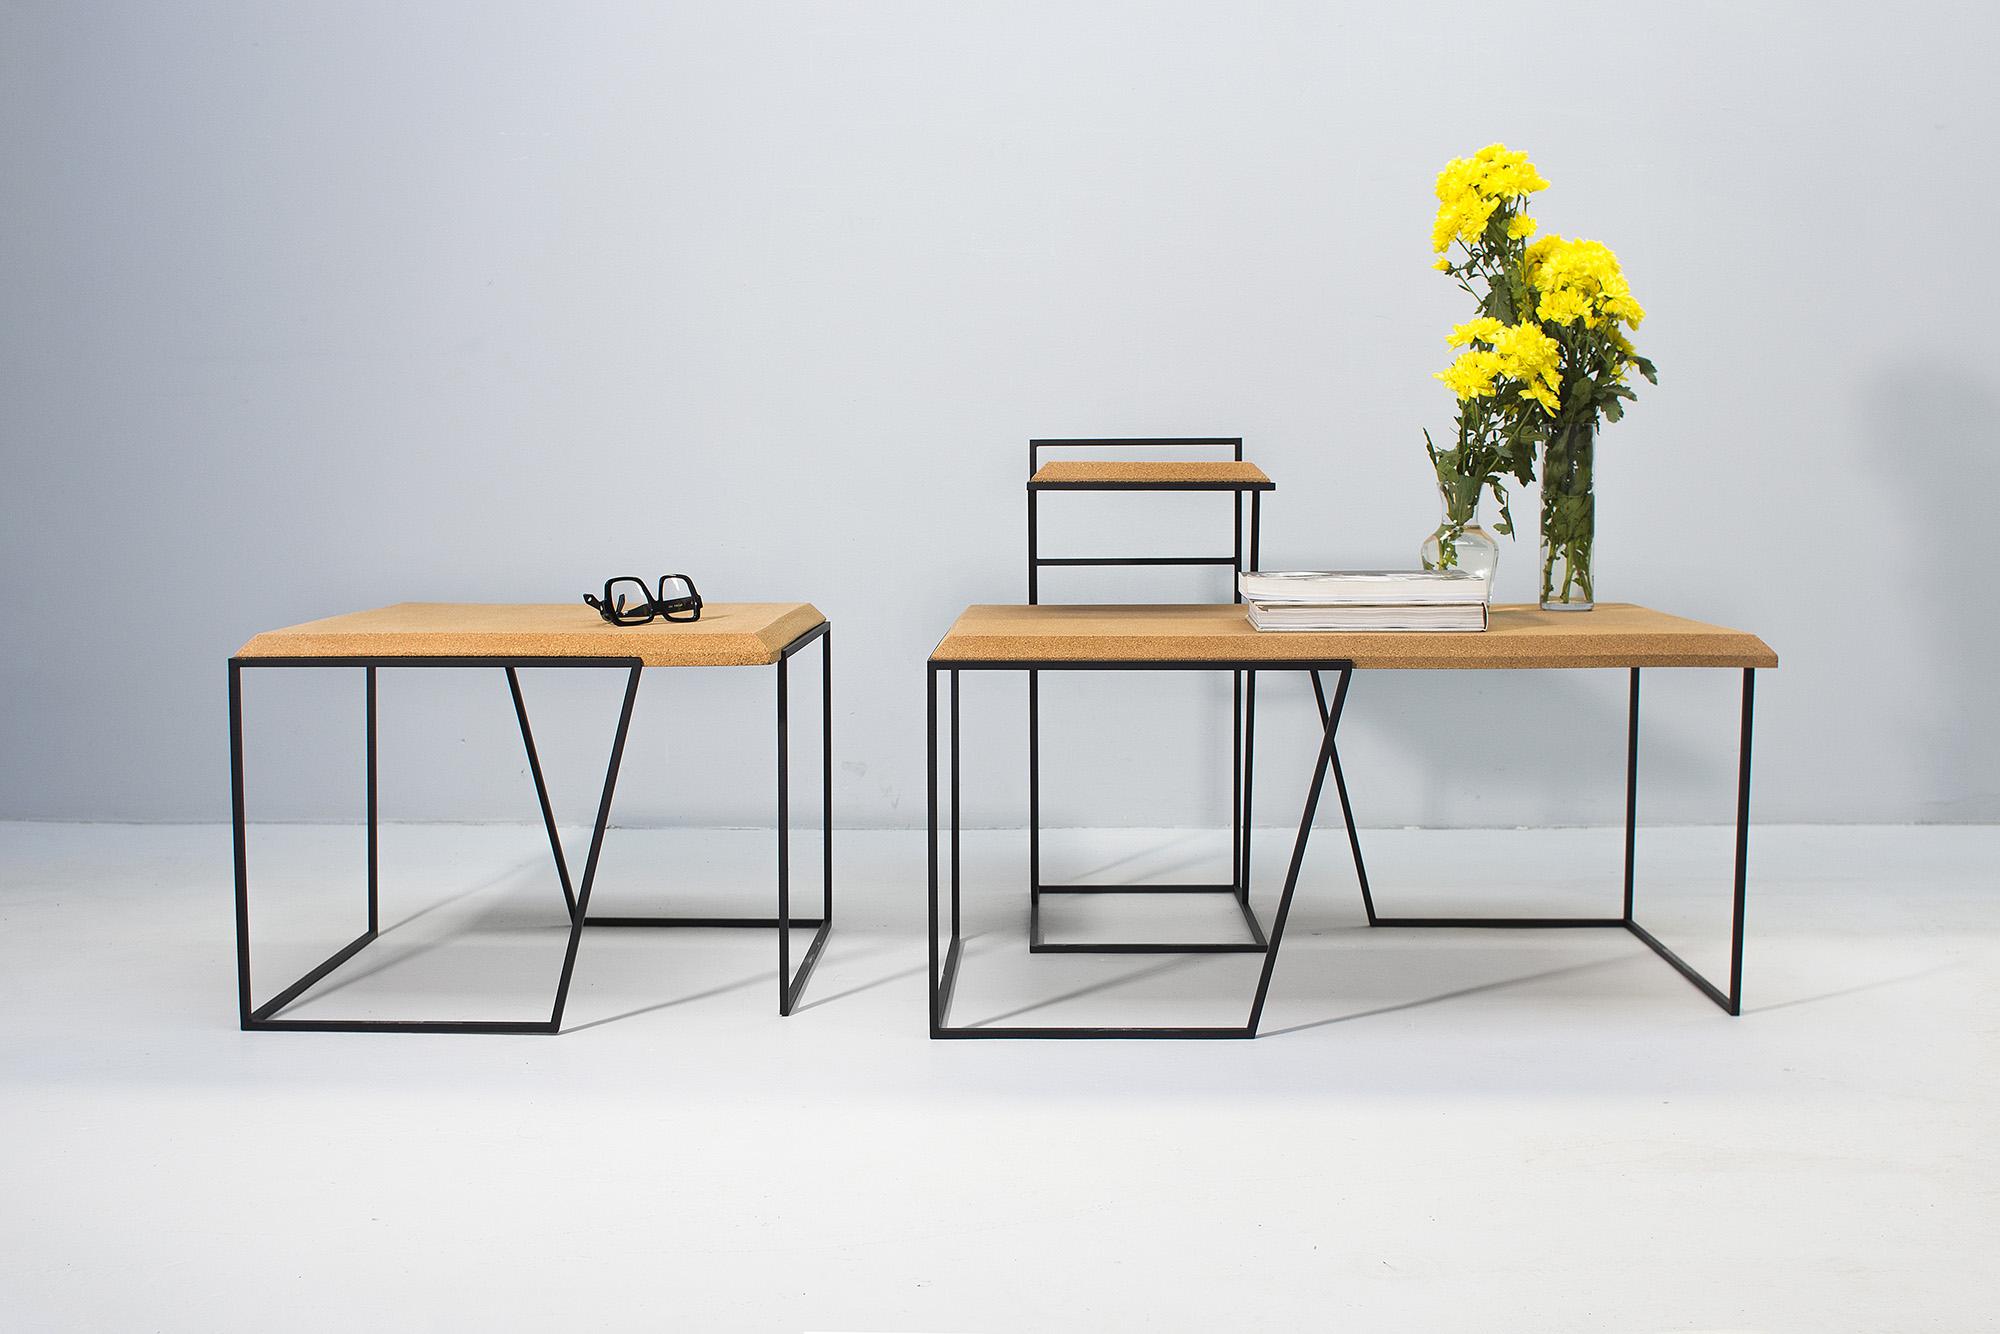 3-galula-grao-table-light-cork-black-4.jpg